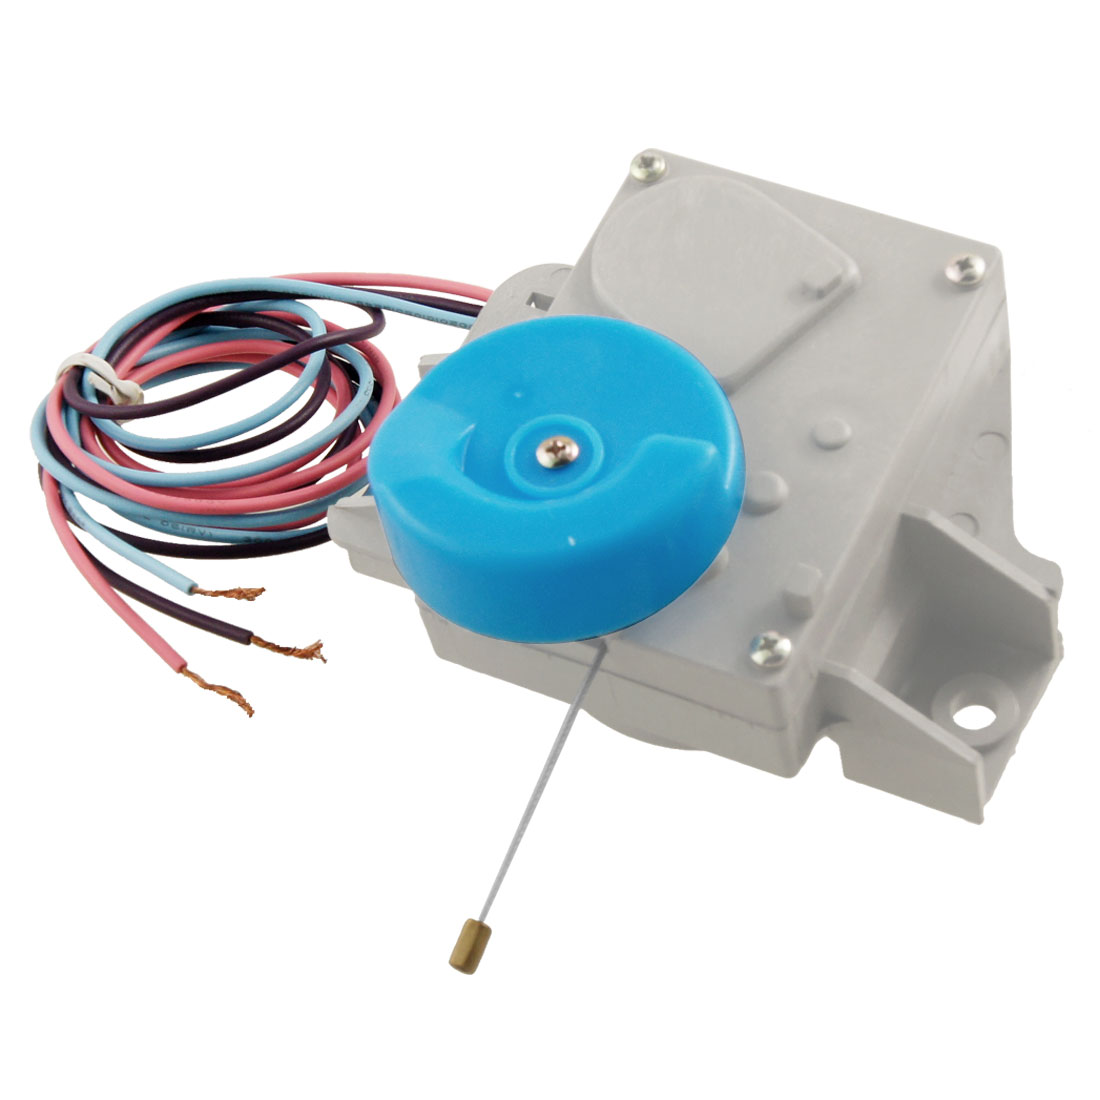 AC 220-250V Drain Motor Retractor for Washing Machine